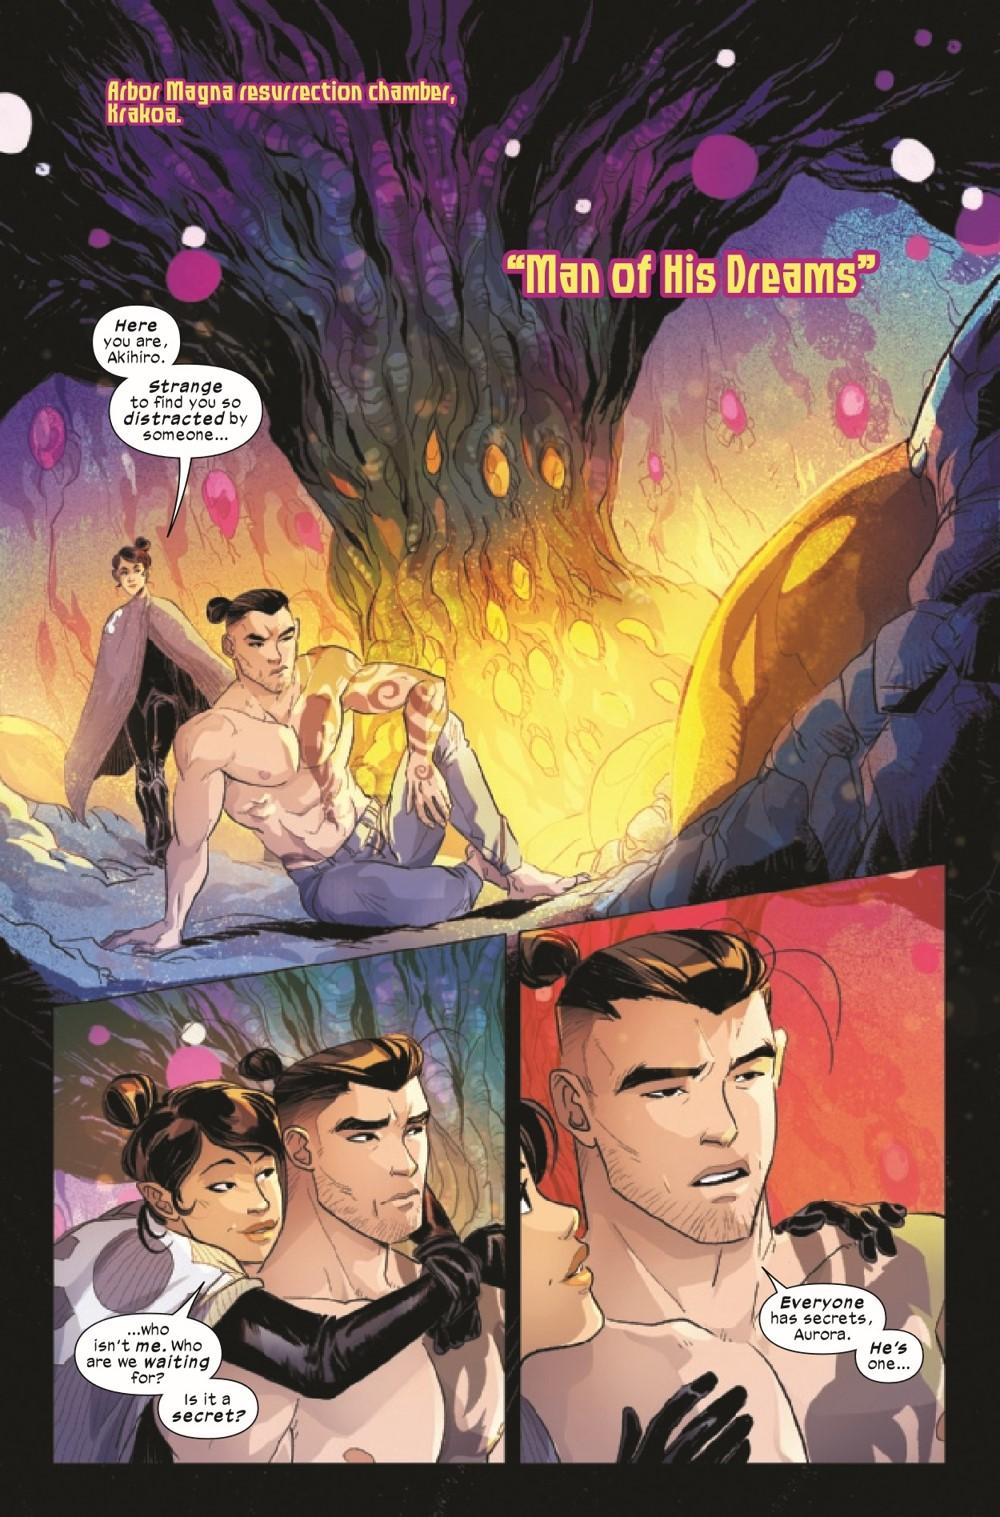 MARVOICESPRIDE2021001_Preview-11 ComicList Previews: MARVEL'S VOICES PRIDE #1